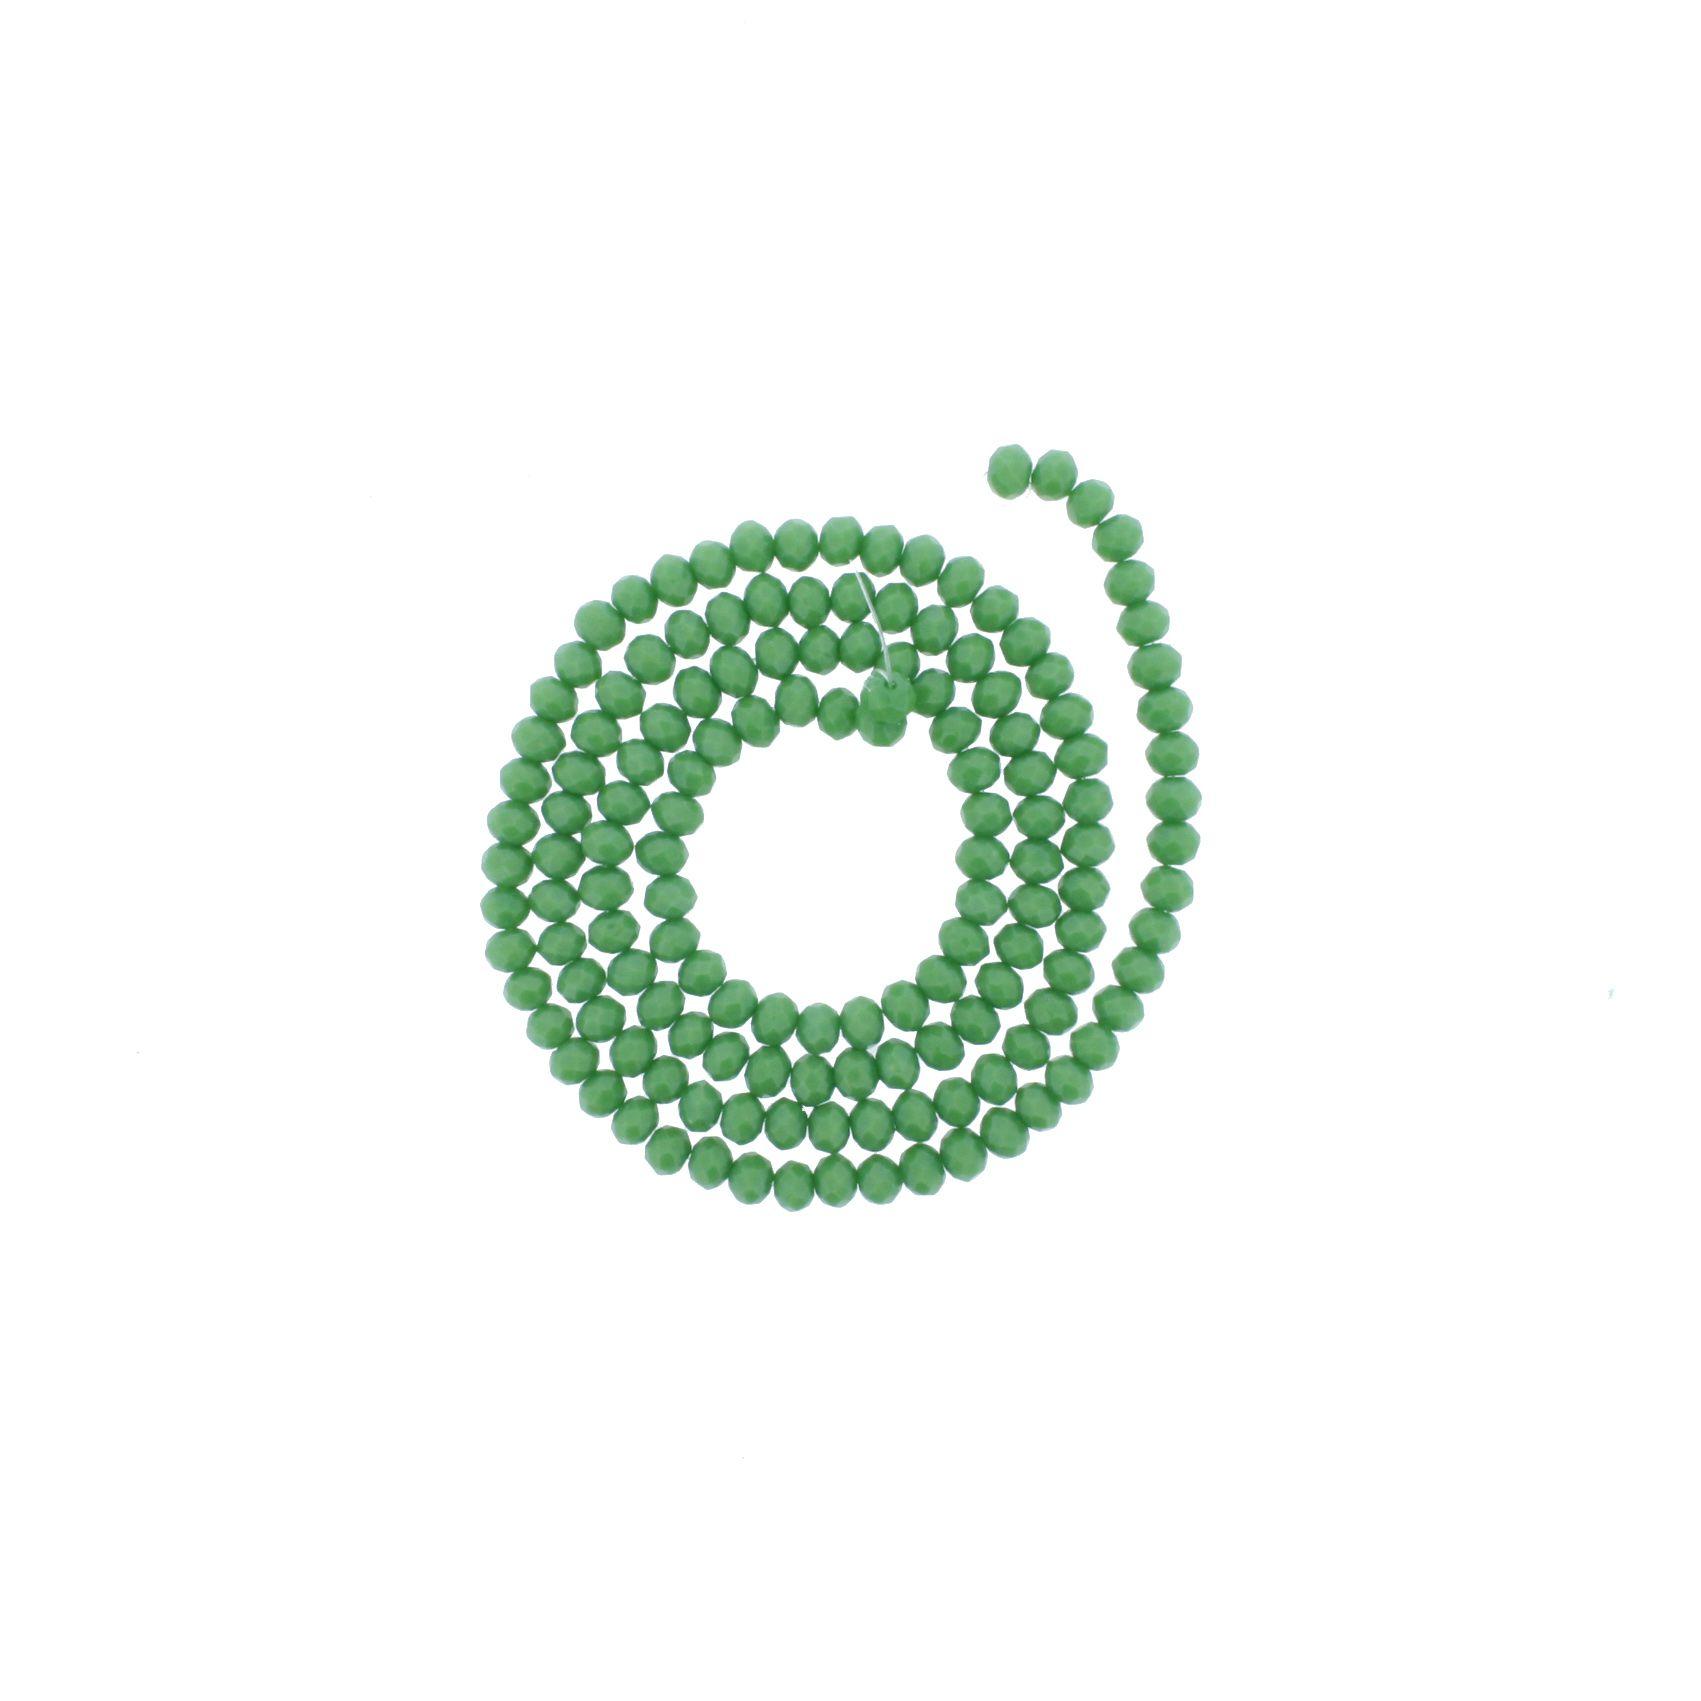 Fio de Cristal - Flat® - Verde - 4mm  - Stéphanie Bijoux® - Peças para Bijuterias e Artesanato